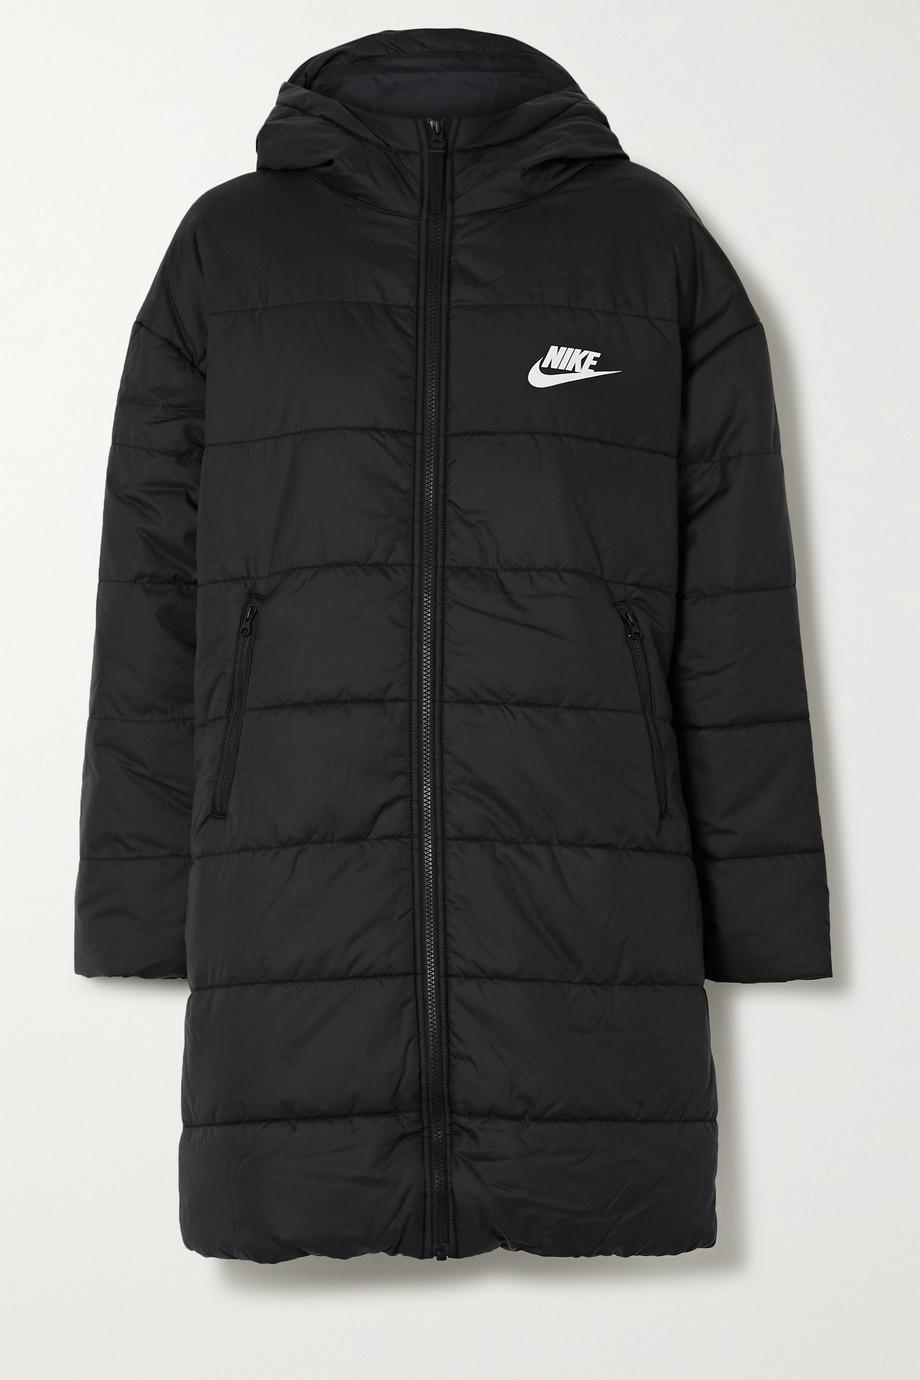 Nike Gesteppter Mantel aus wattiertem Shell mit Kapuze